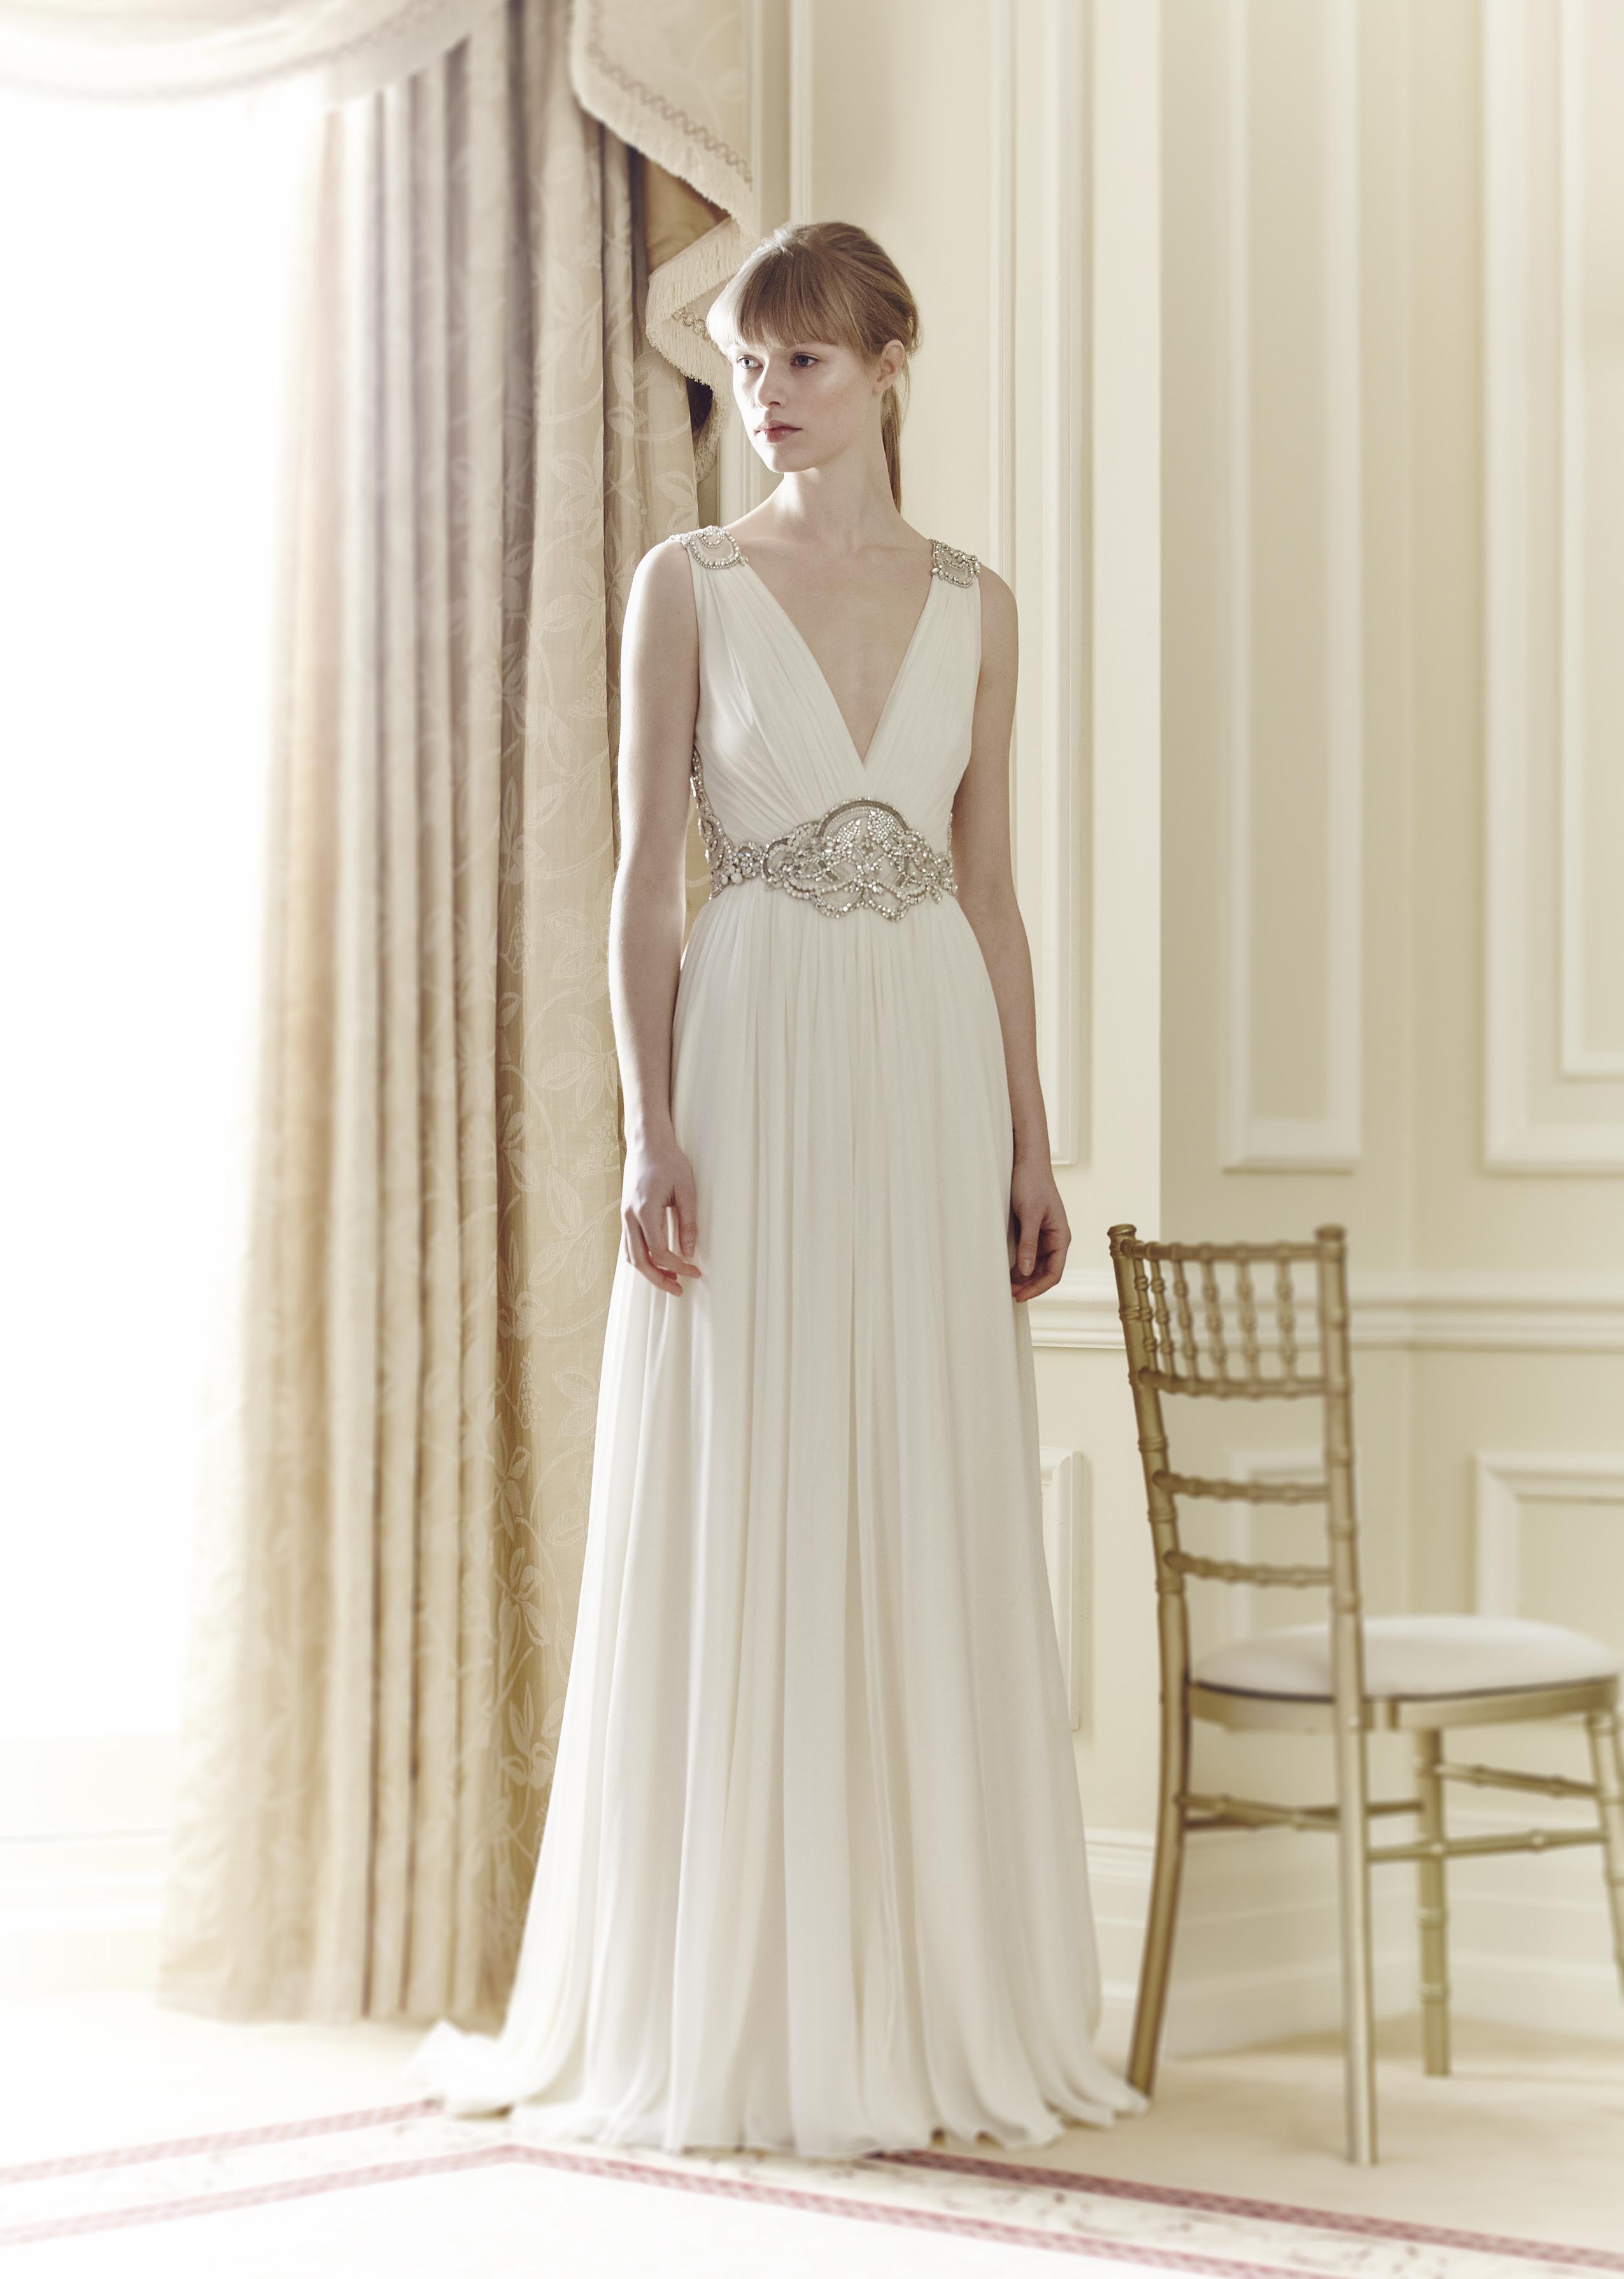 Jenny Packham Bridal Collection Spring Summer 2014 Wedding